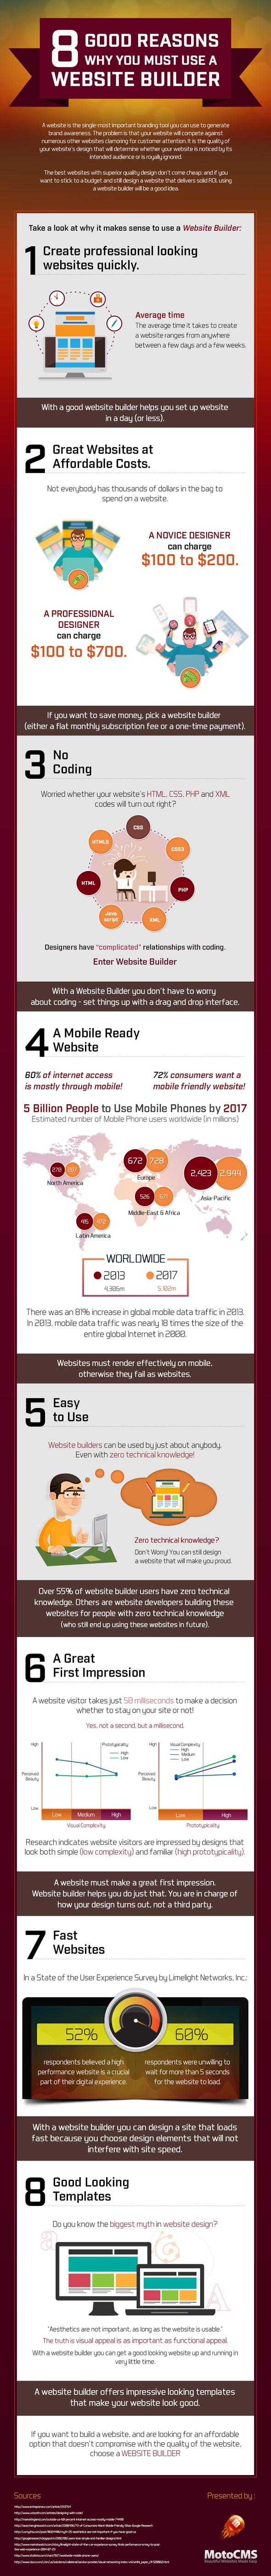 MotoCMS How to Make a Website Infographic